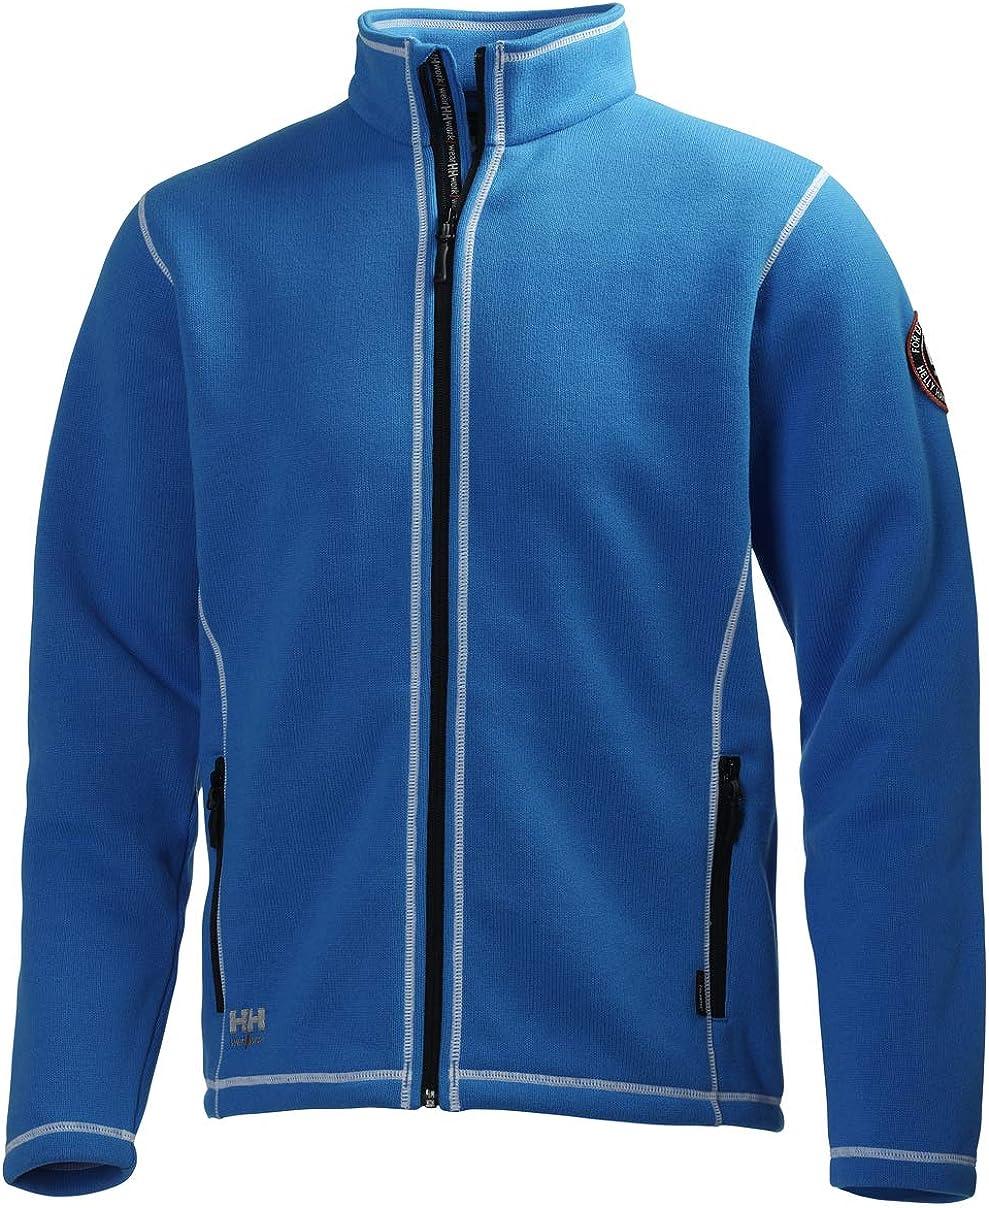 Helly Hansen Workwear Men's Hay River Polartec Fleece Big and Tall Jacket